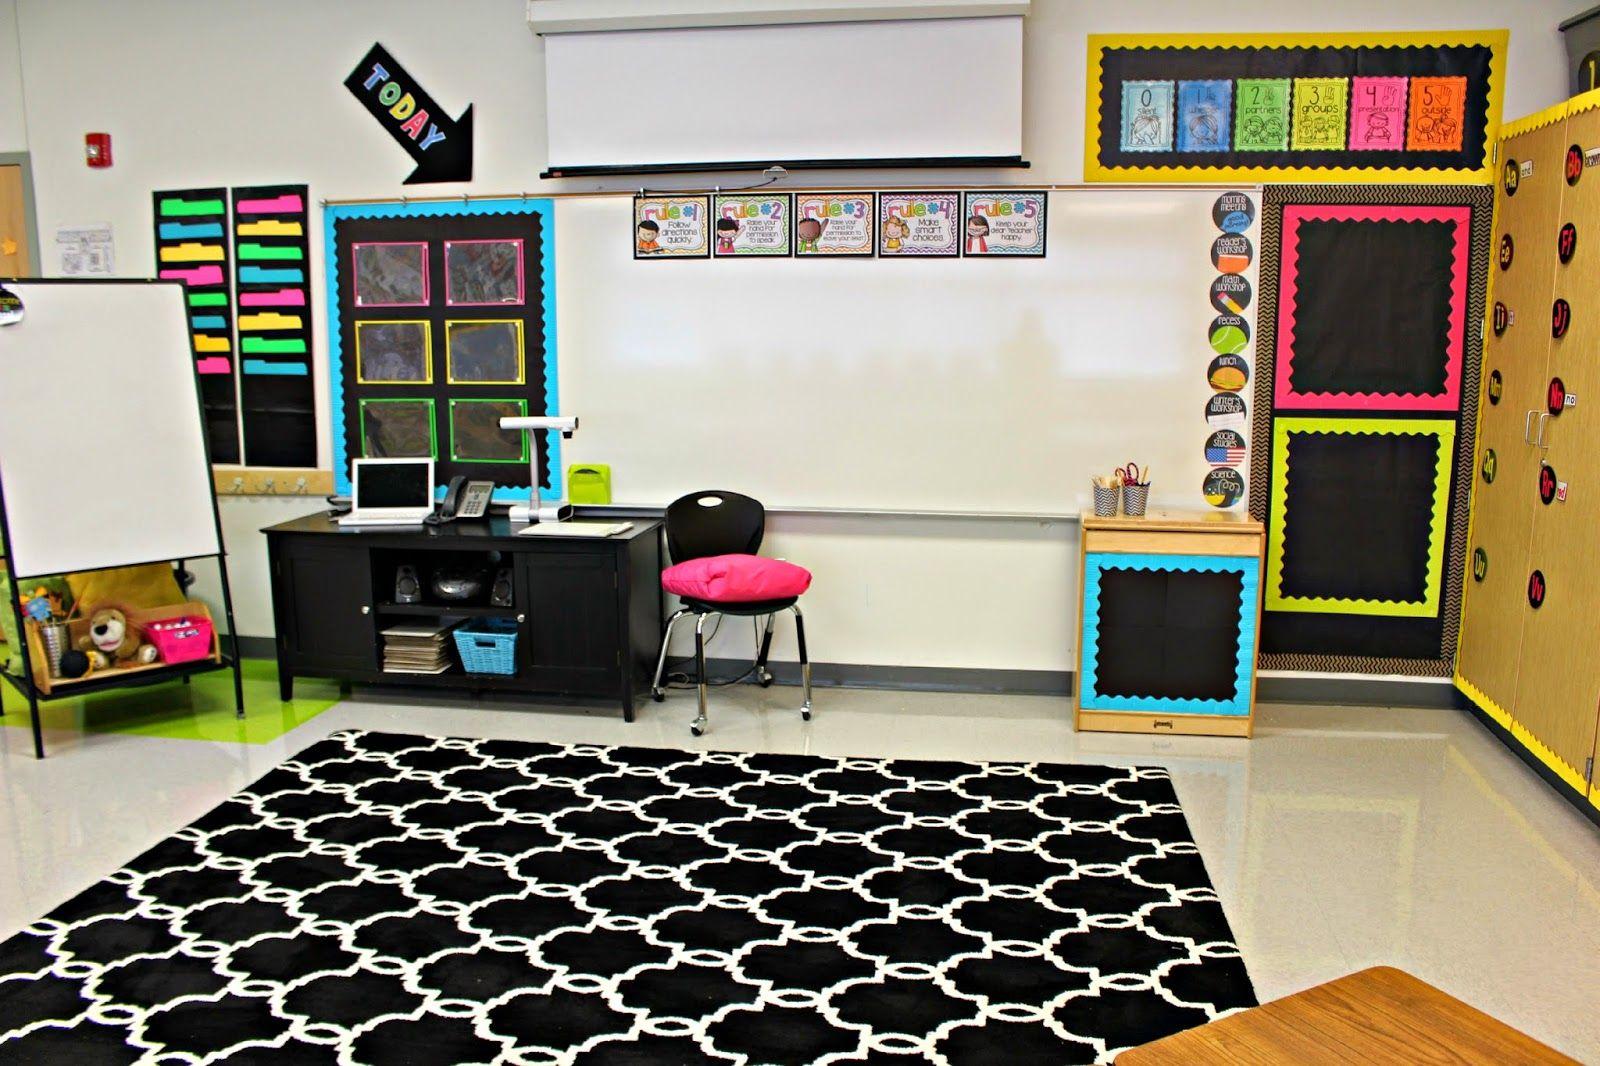 Classroom Design Ideas 4th Grade : The gallery for gt fourth grade classroom decorating ideas